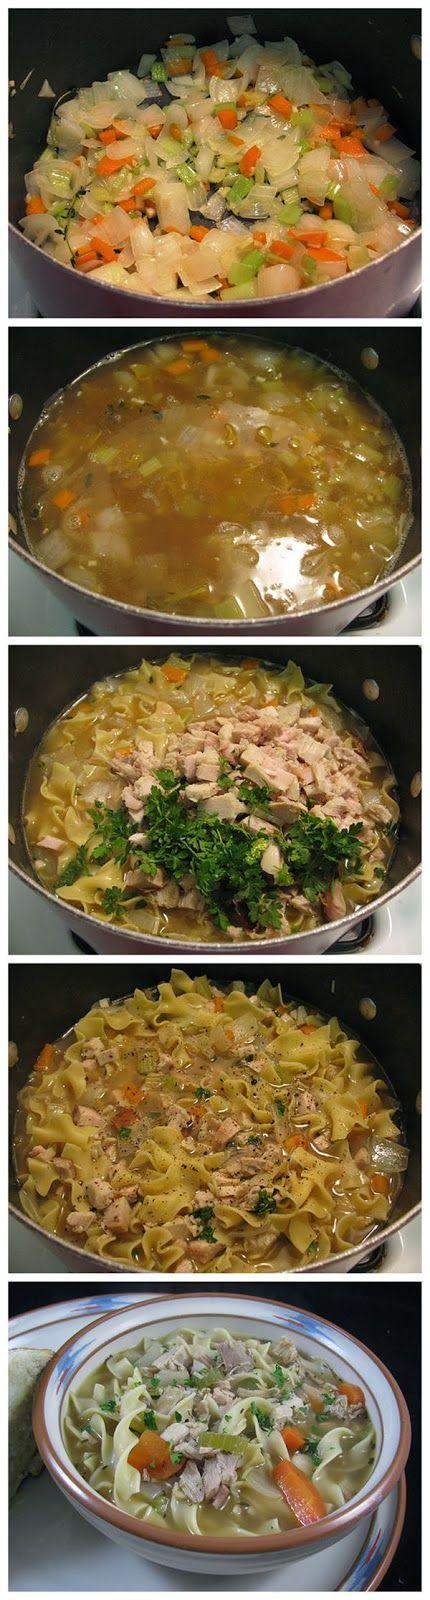 Easy Classic Turkey Noodle Soup - Truelifekitchen